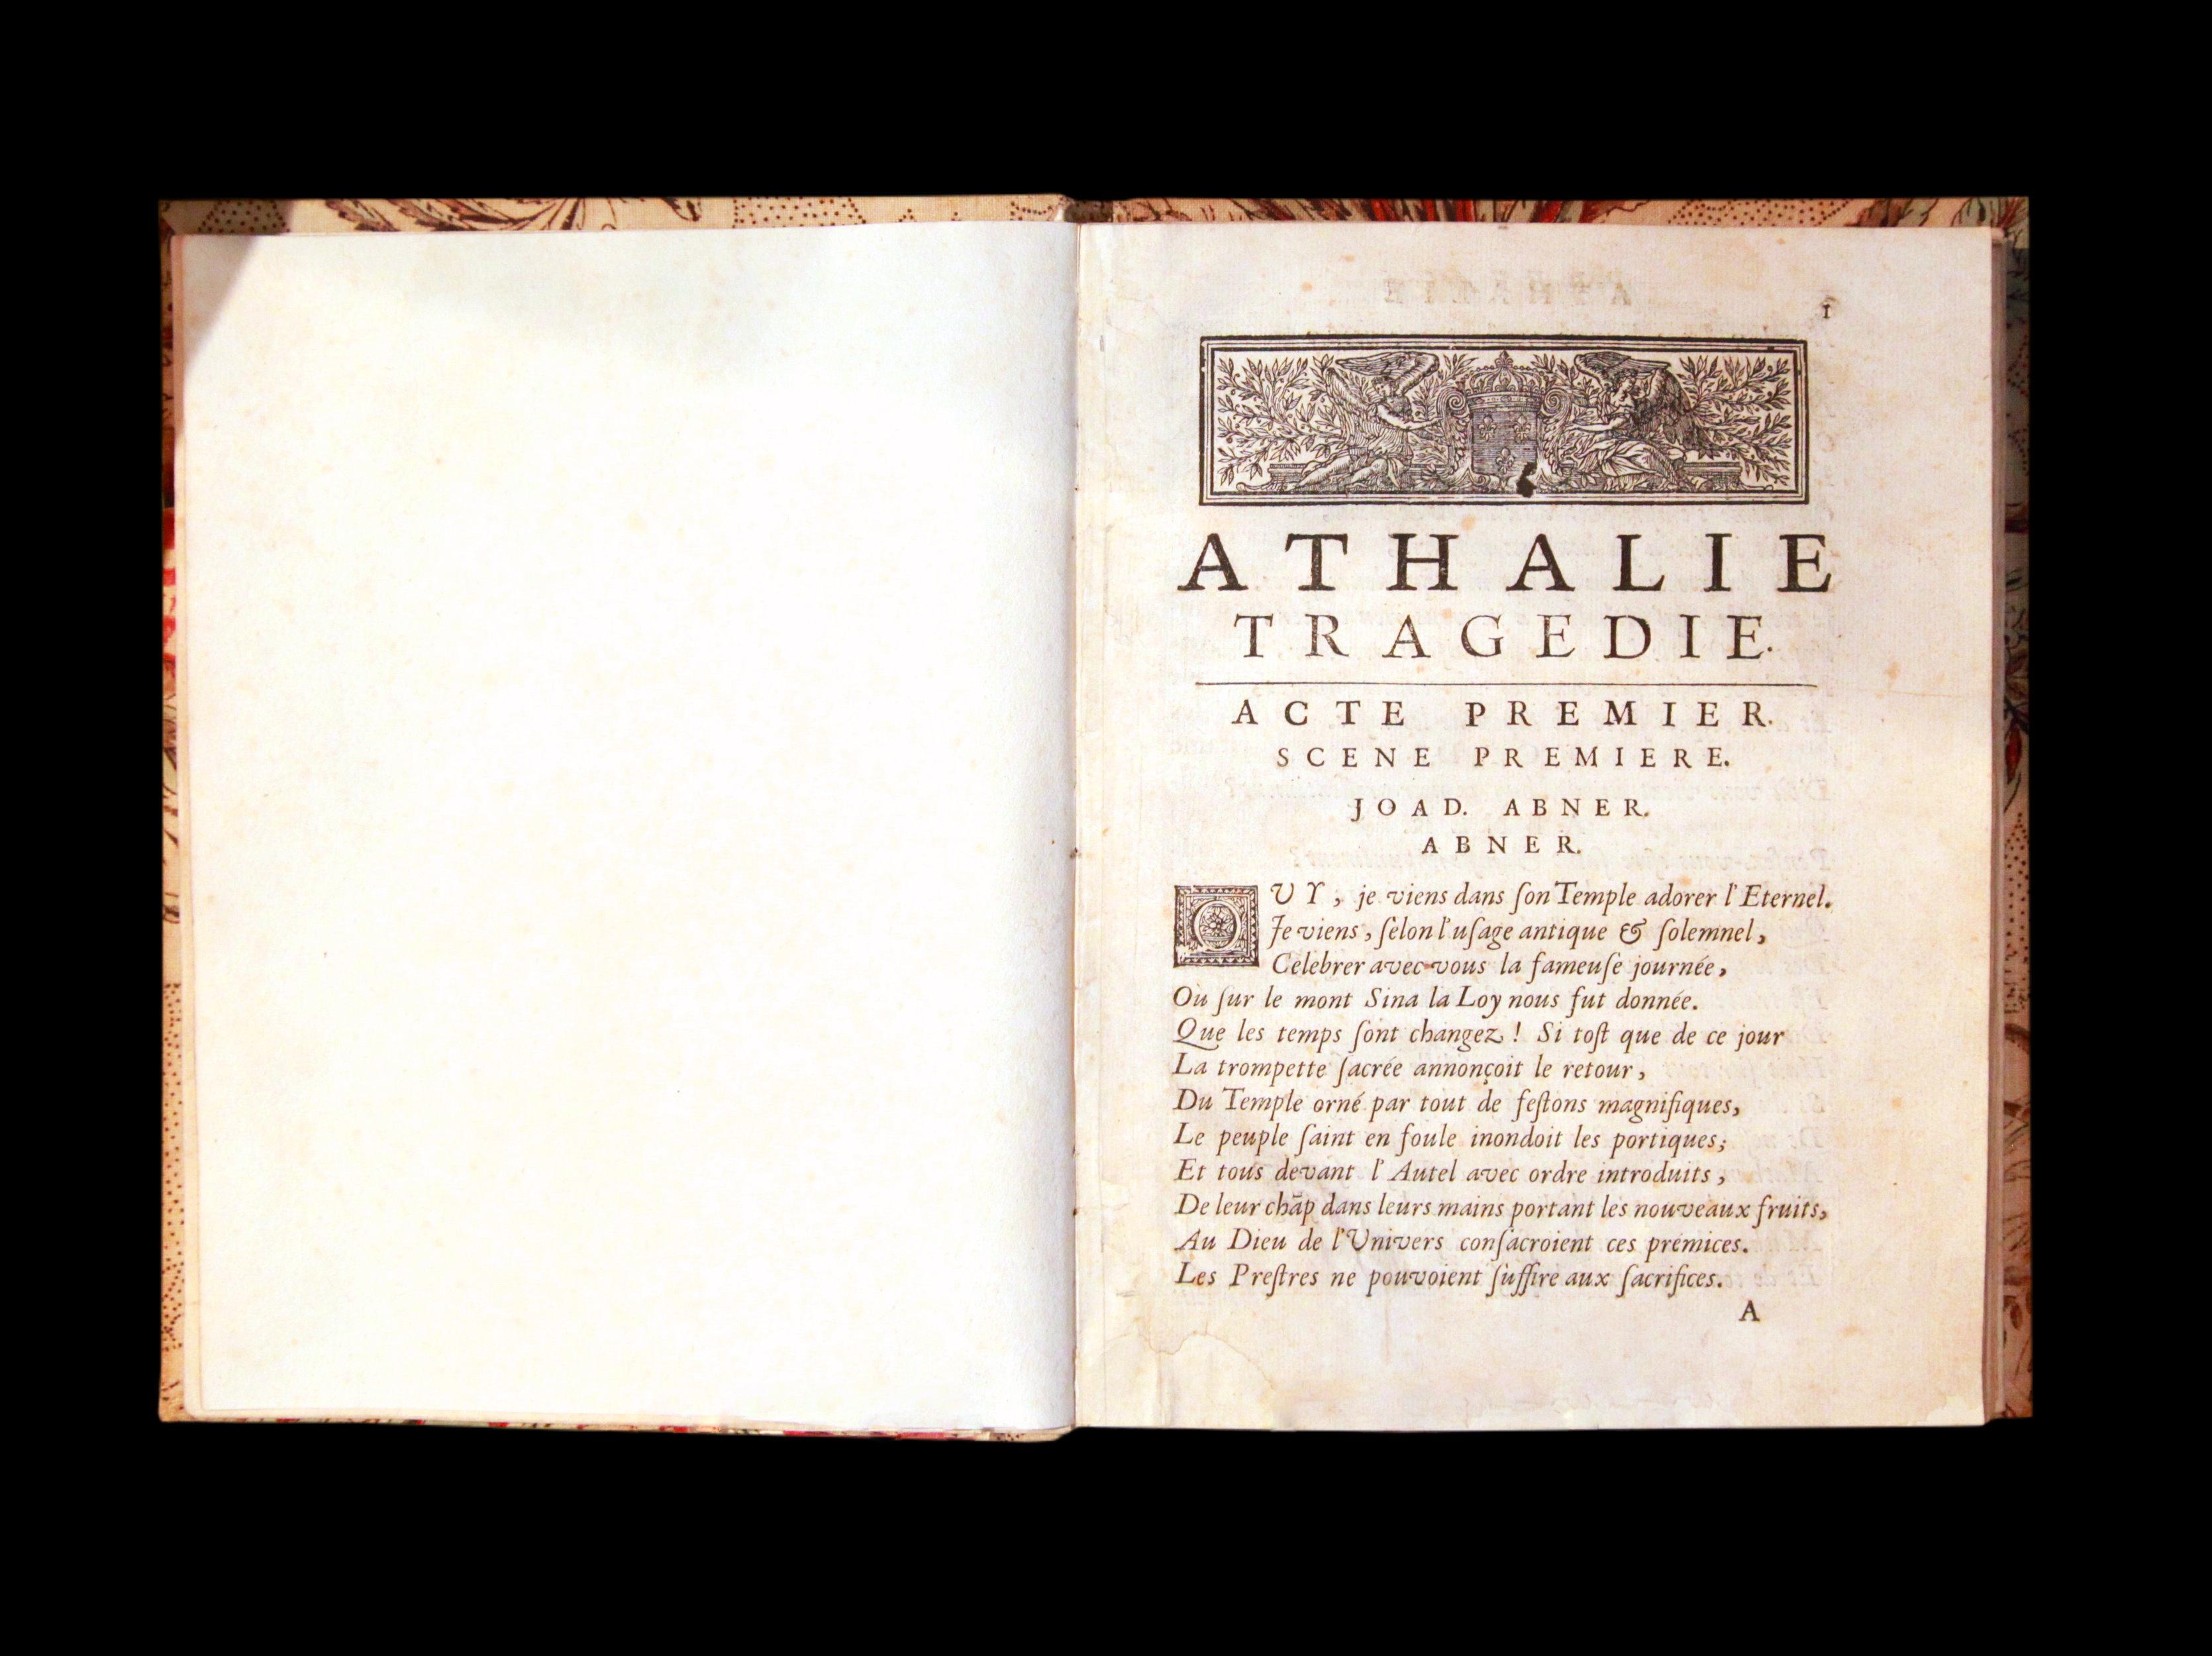 056.Athalie